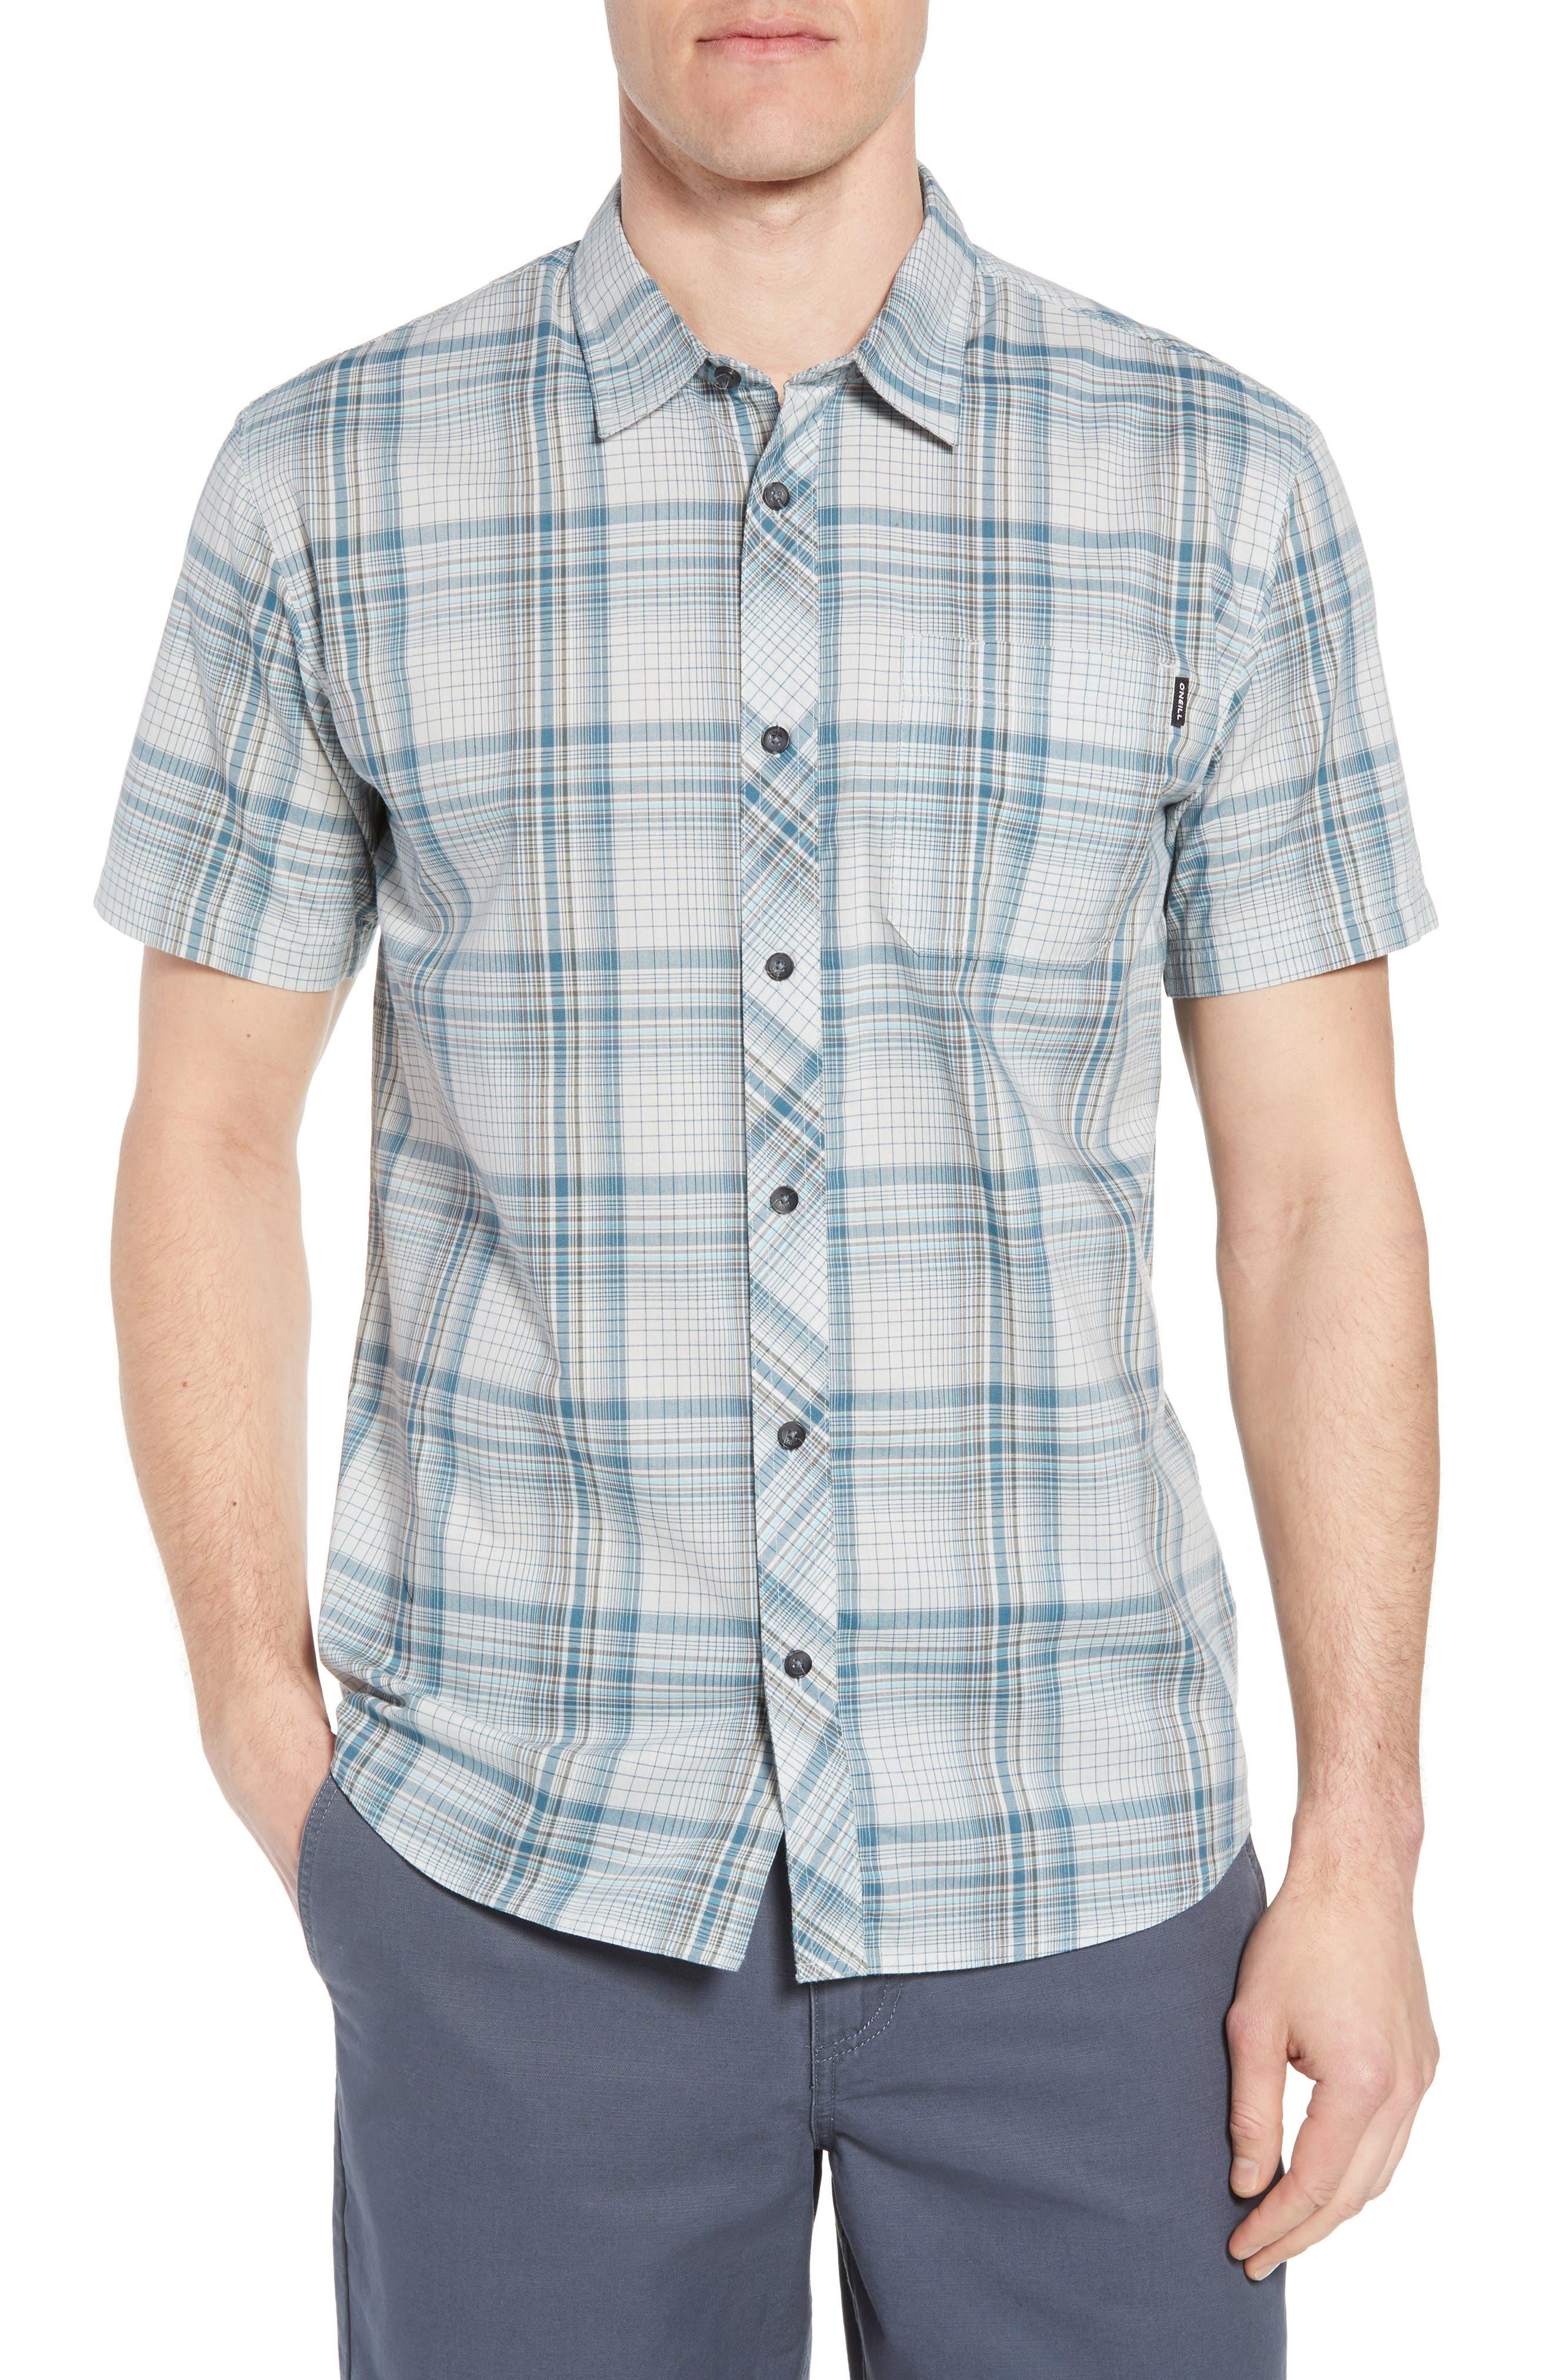 Sturghill Woven Shirt,                             Main thumbnail 1, color,                             036